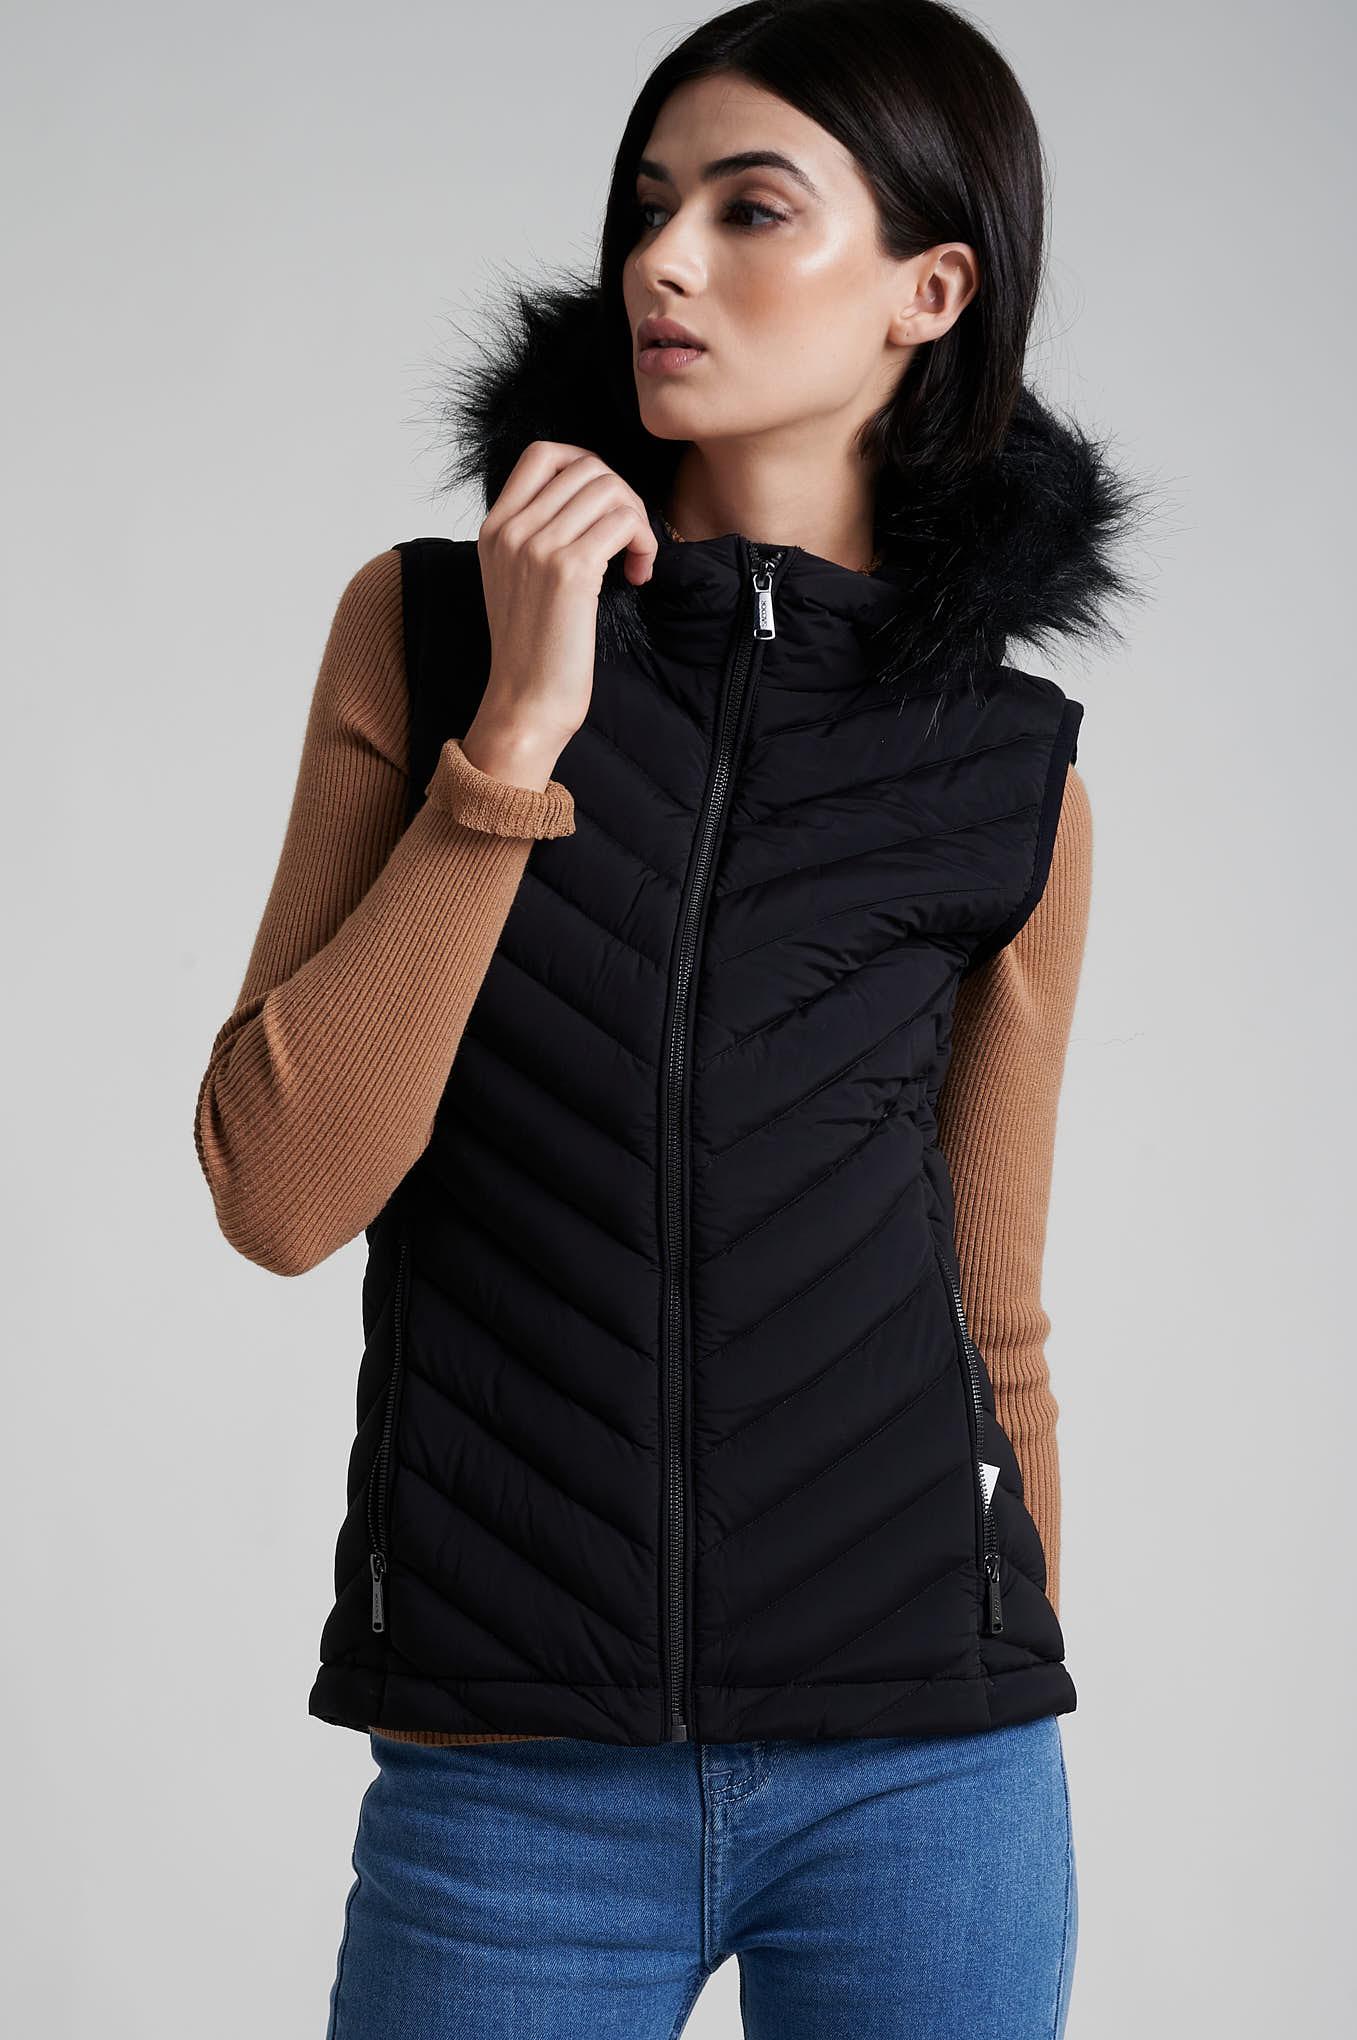 Waist Coat Black Casual Woman